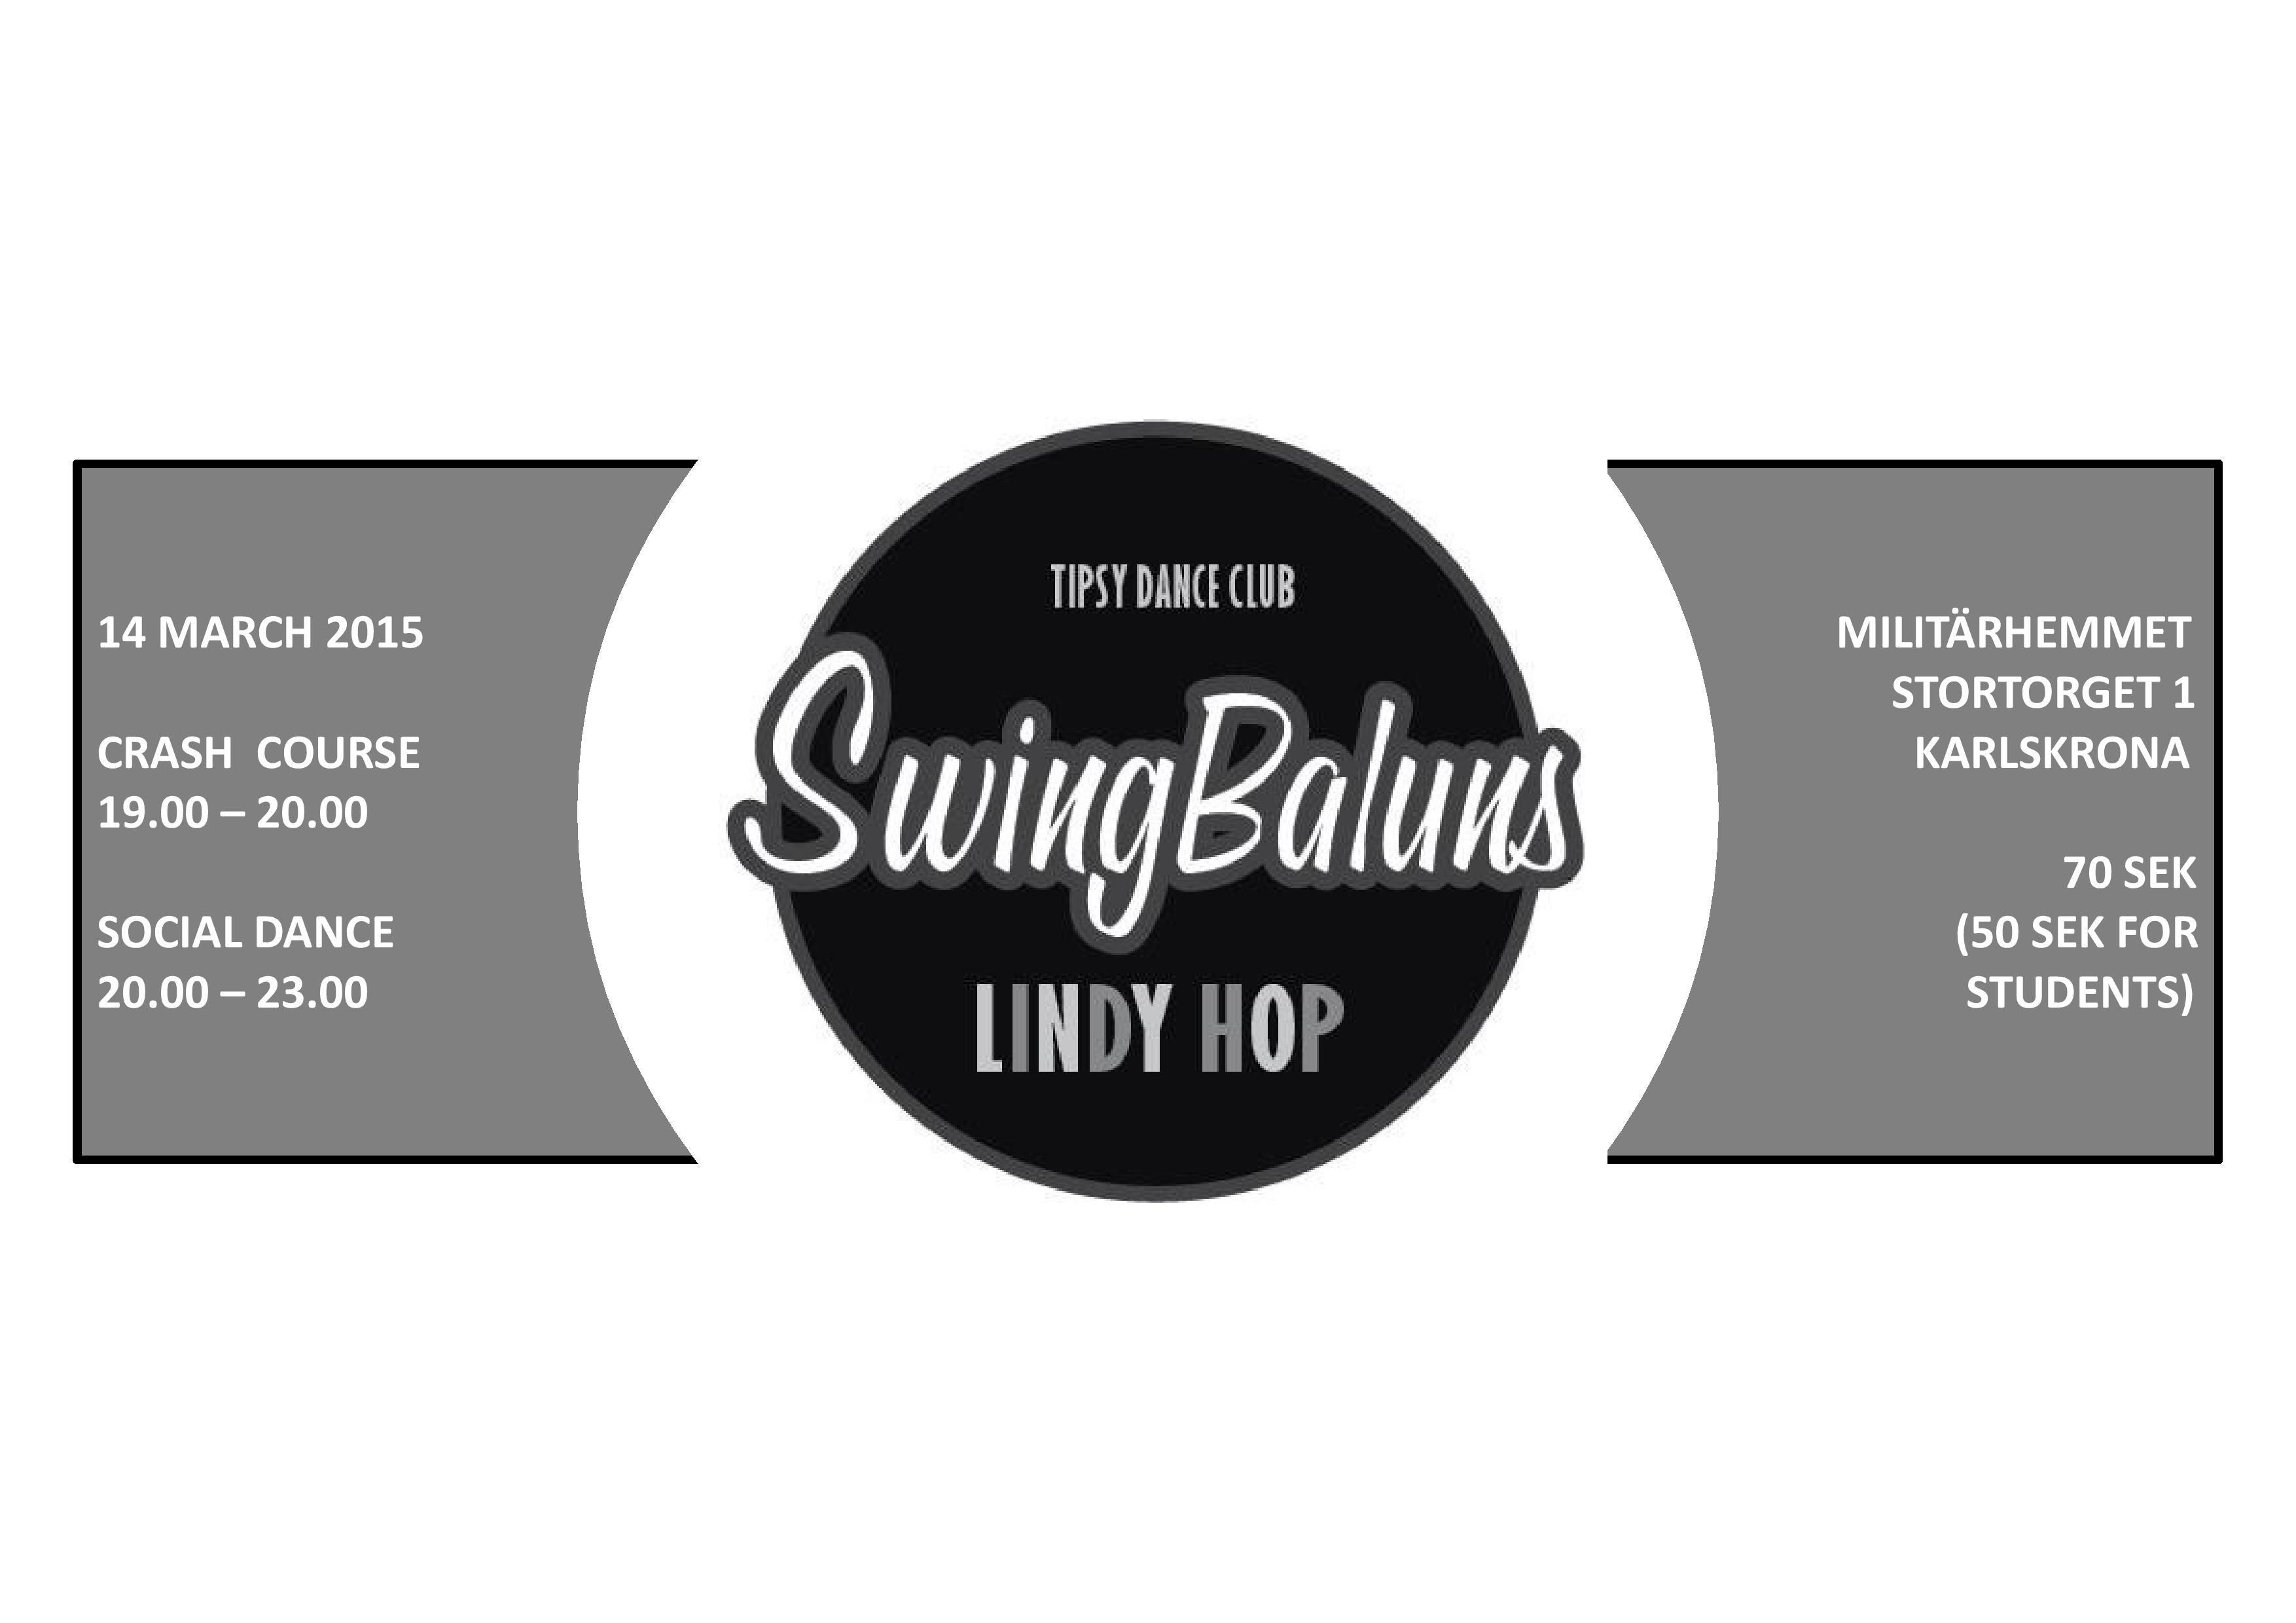 Swingbaluns